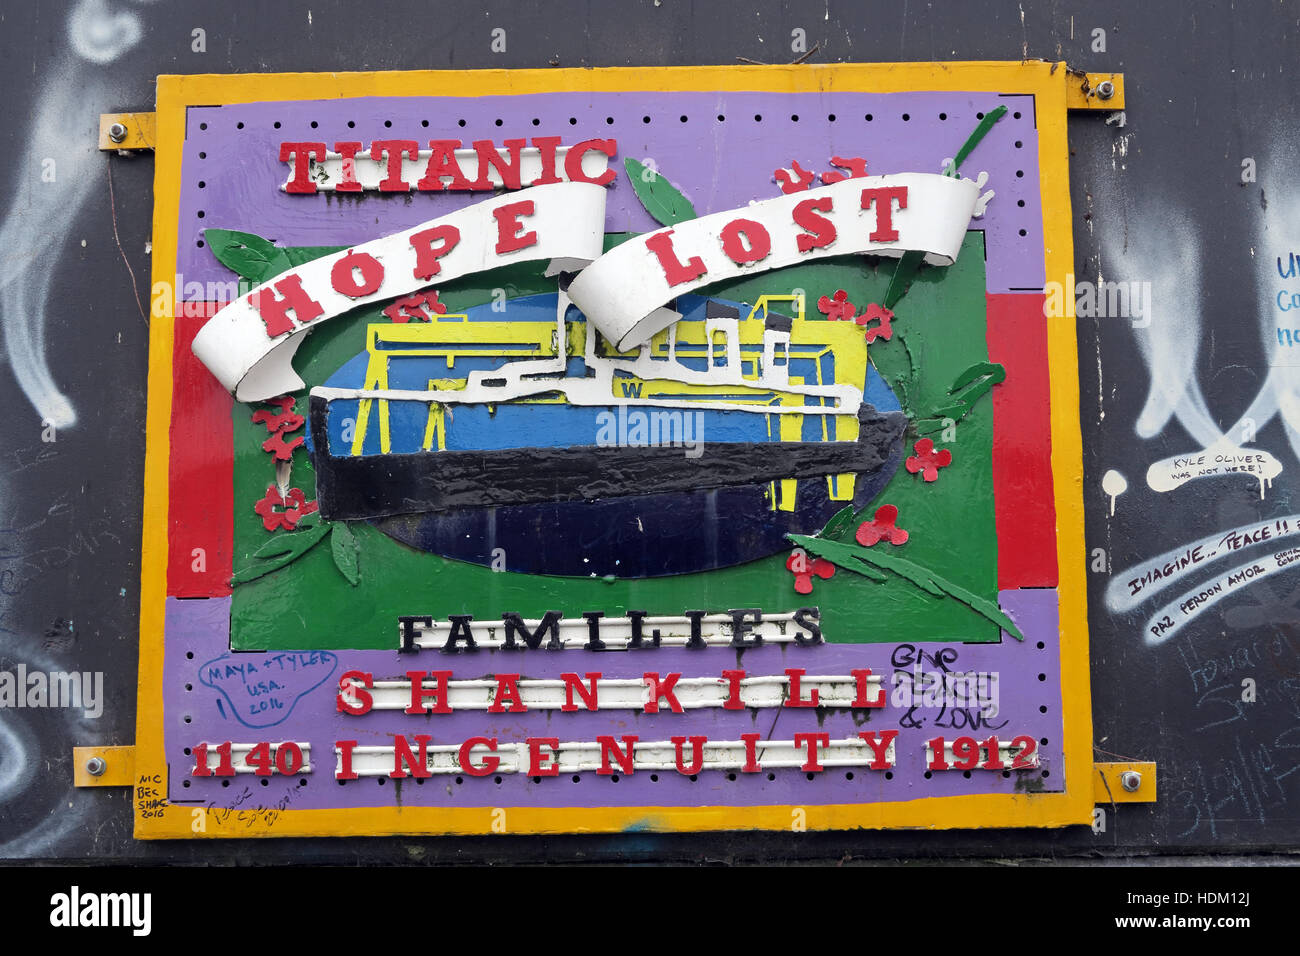 Laden Sie dieses Alamy Stockfoto Titanic Hope Lost - Belfast International Peace Wand Cupar Weg, West Belfast, NI, UK - HDM12J